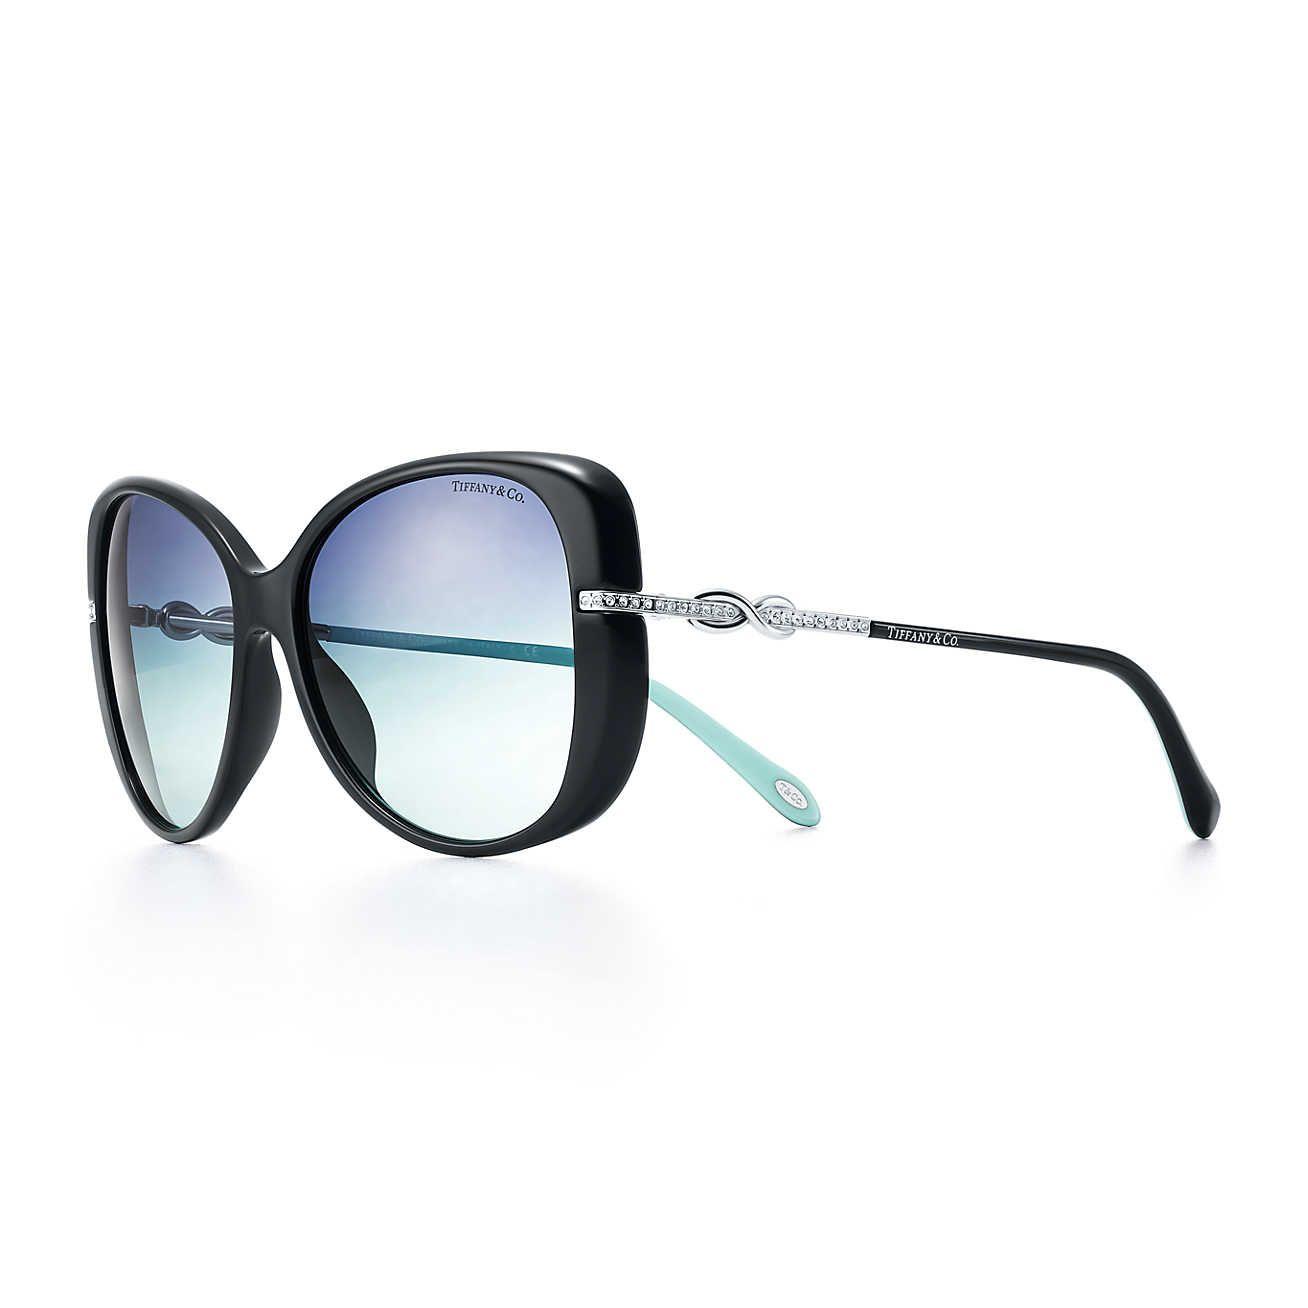 3da8e85dffc1 Tiffany Infinity butterfly sunglasses in black and Tiffany Blue acetate.